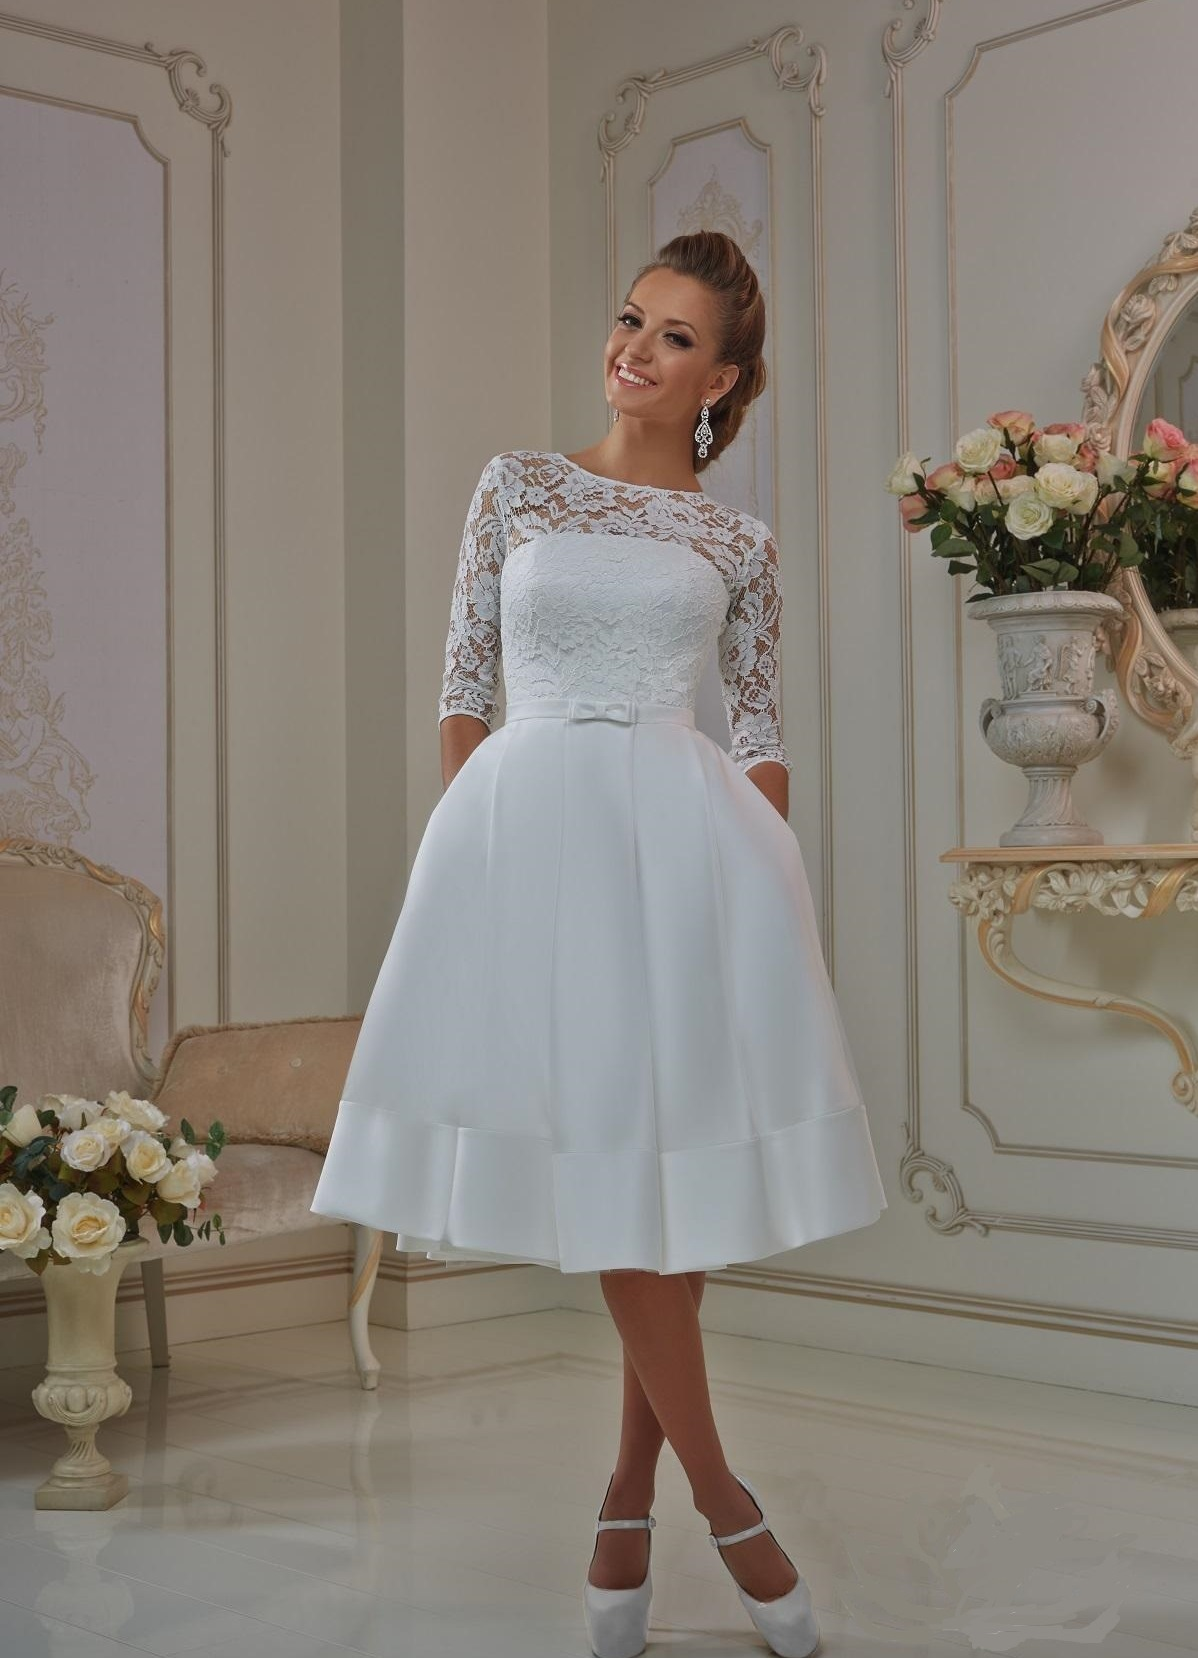 Свадебные платья для беременных на 5 месяце1 ... 33c8ffd613b